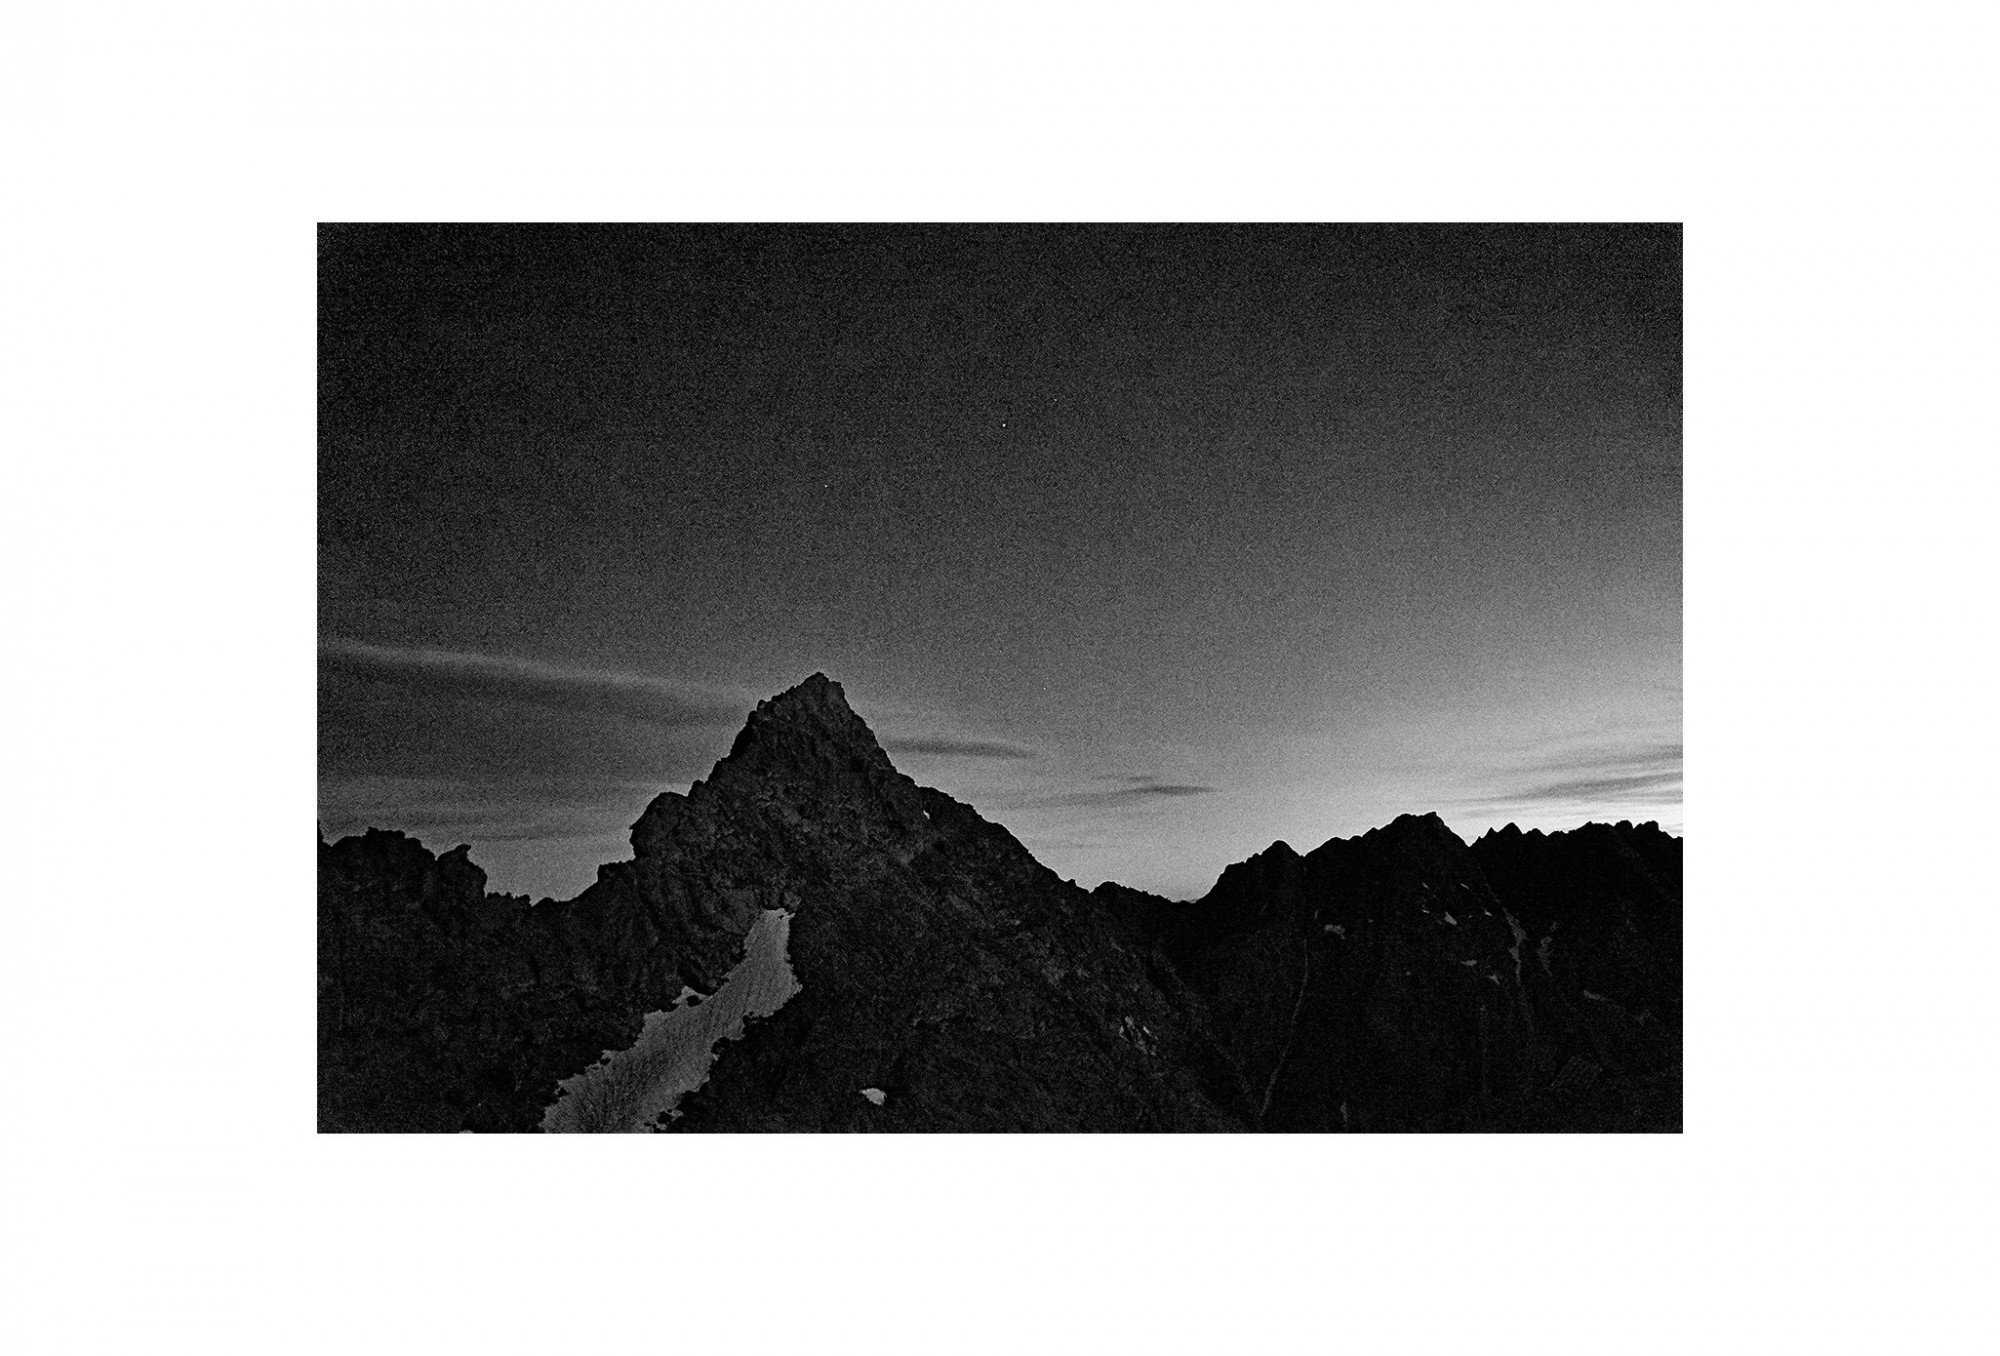 Afbeelding: Landscape high Tatras mountains Slovakia, foto Van Huffel, foto kunst zwart wit, landschapsfotografie.